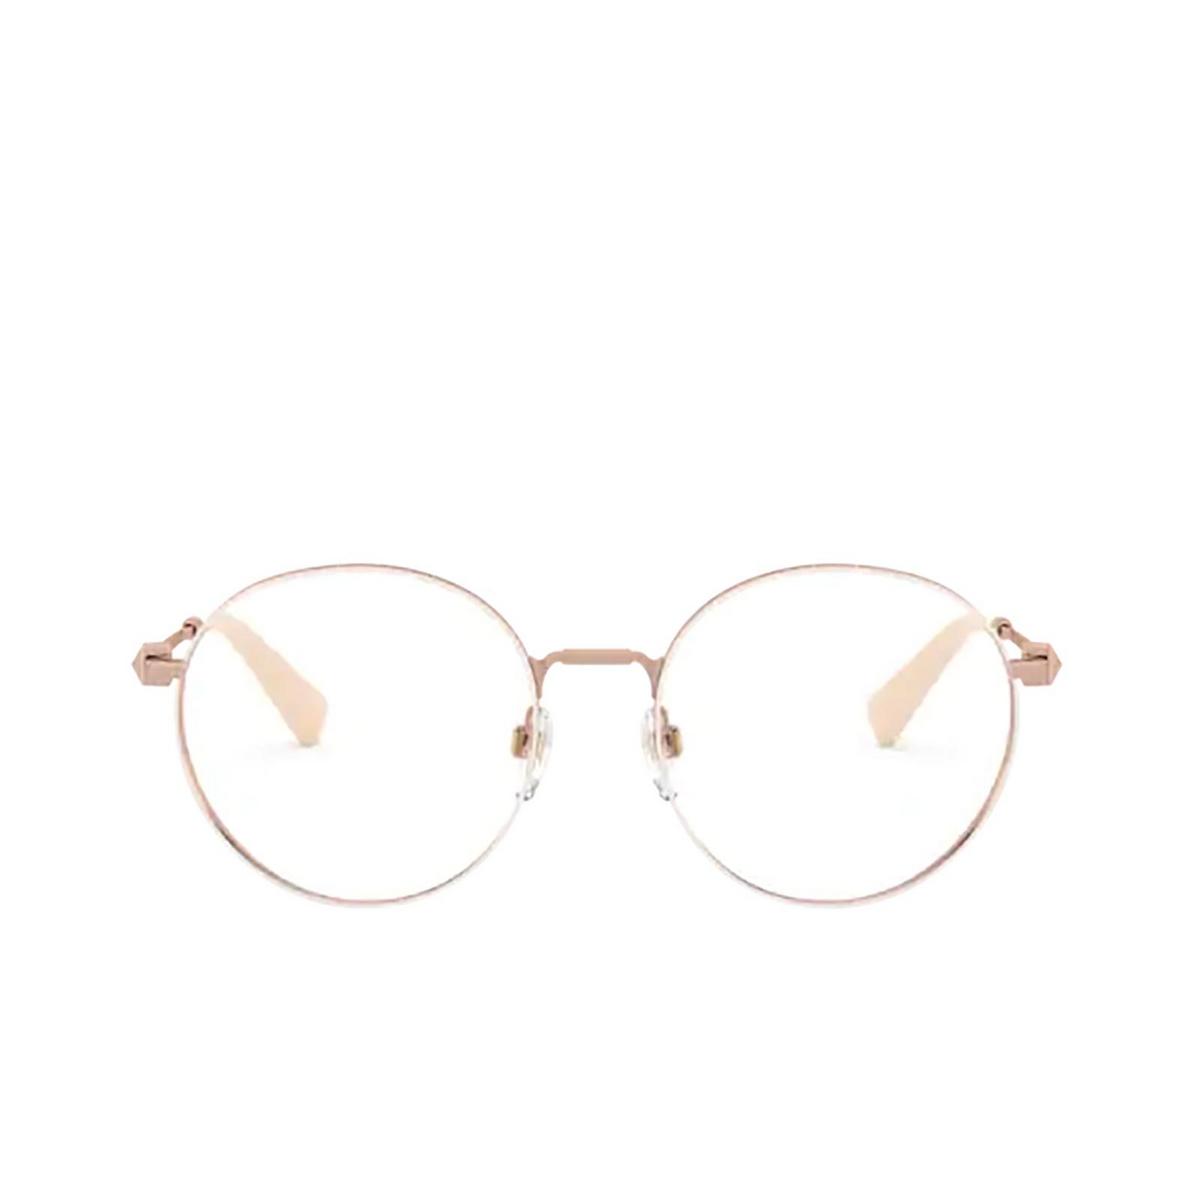 Valentino® Round Eyeglasses: VA1020 color Rose Gold / Beige 3013 - front view.